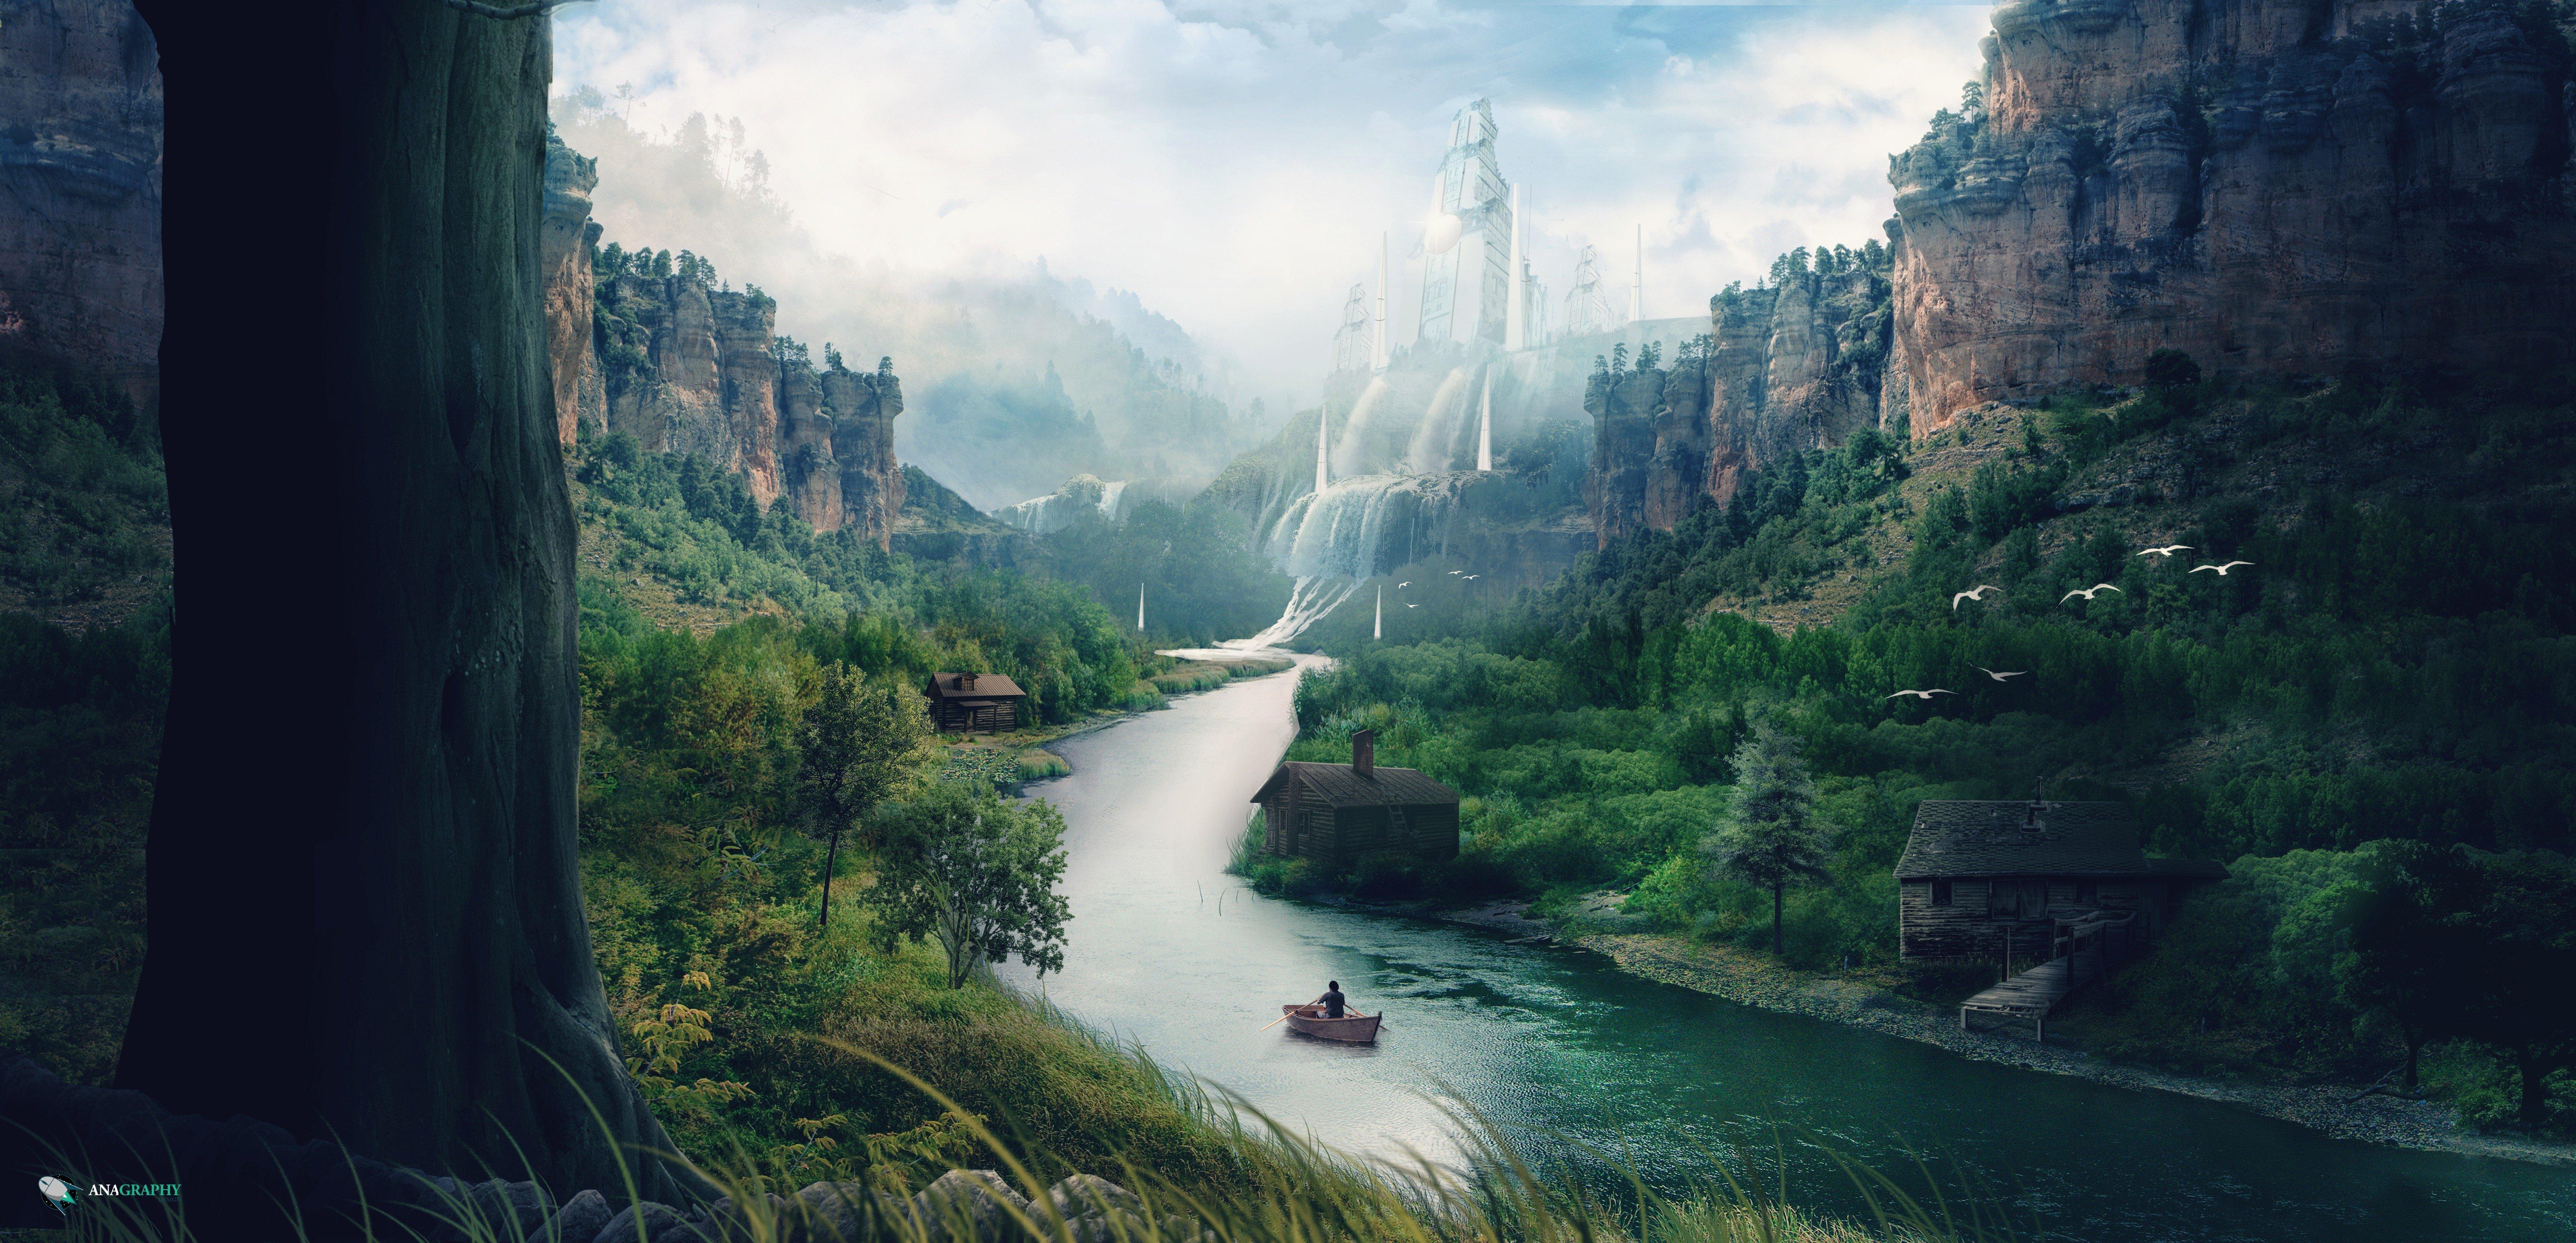 Free Fall Wallpapers Desktop Landscape River Mountains Stream Waterfall Boat